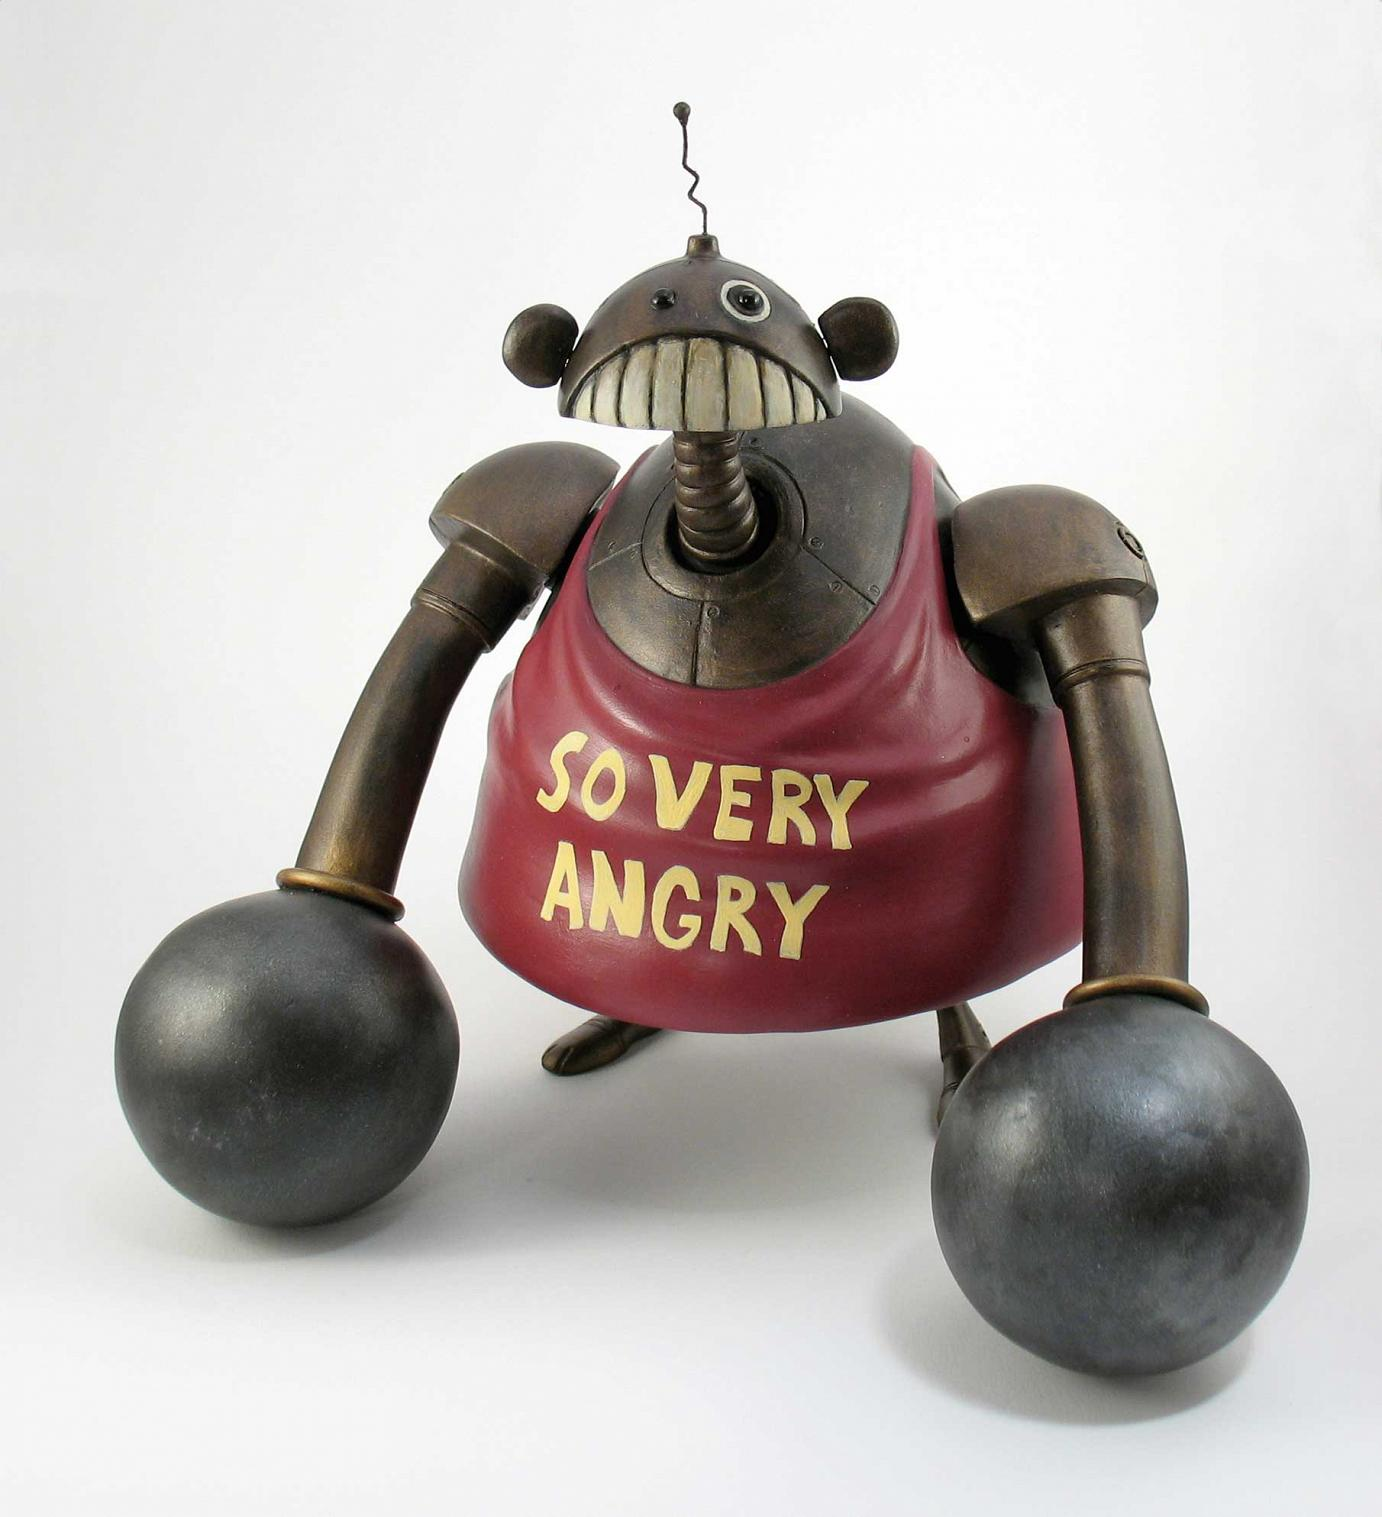 Dave Pressler »Angry Clobber Monkey« 2008 · Spielzeug-Skulptur · Vinyl · 20,3 cm hoch